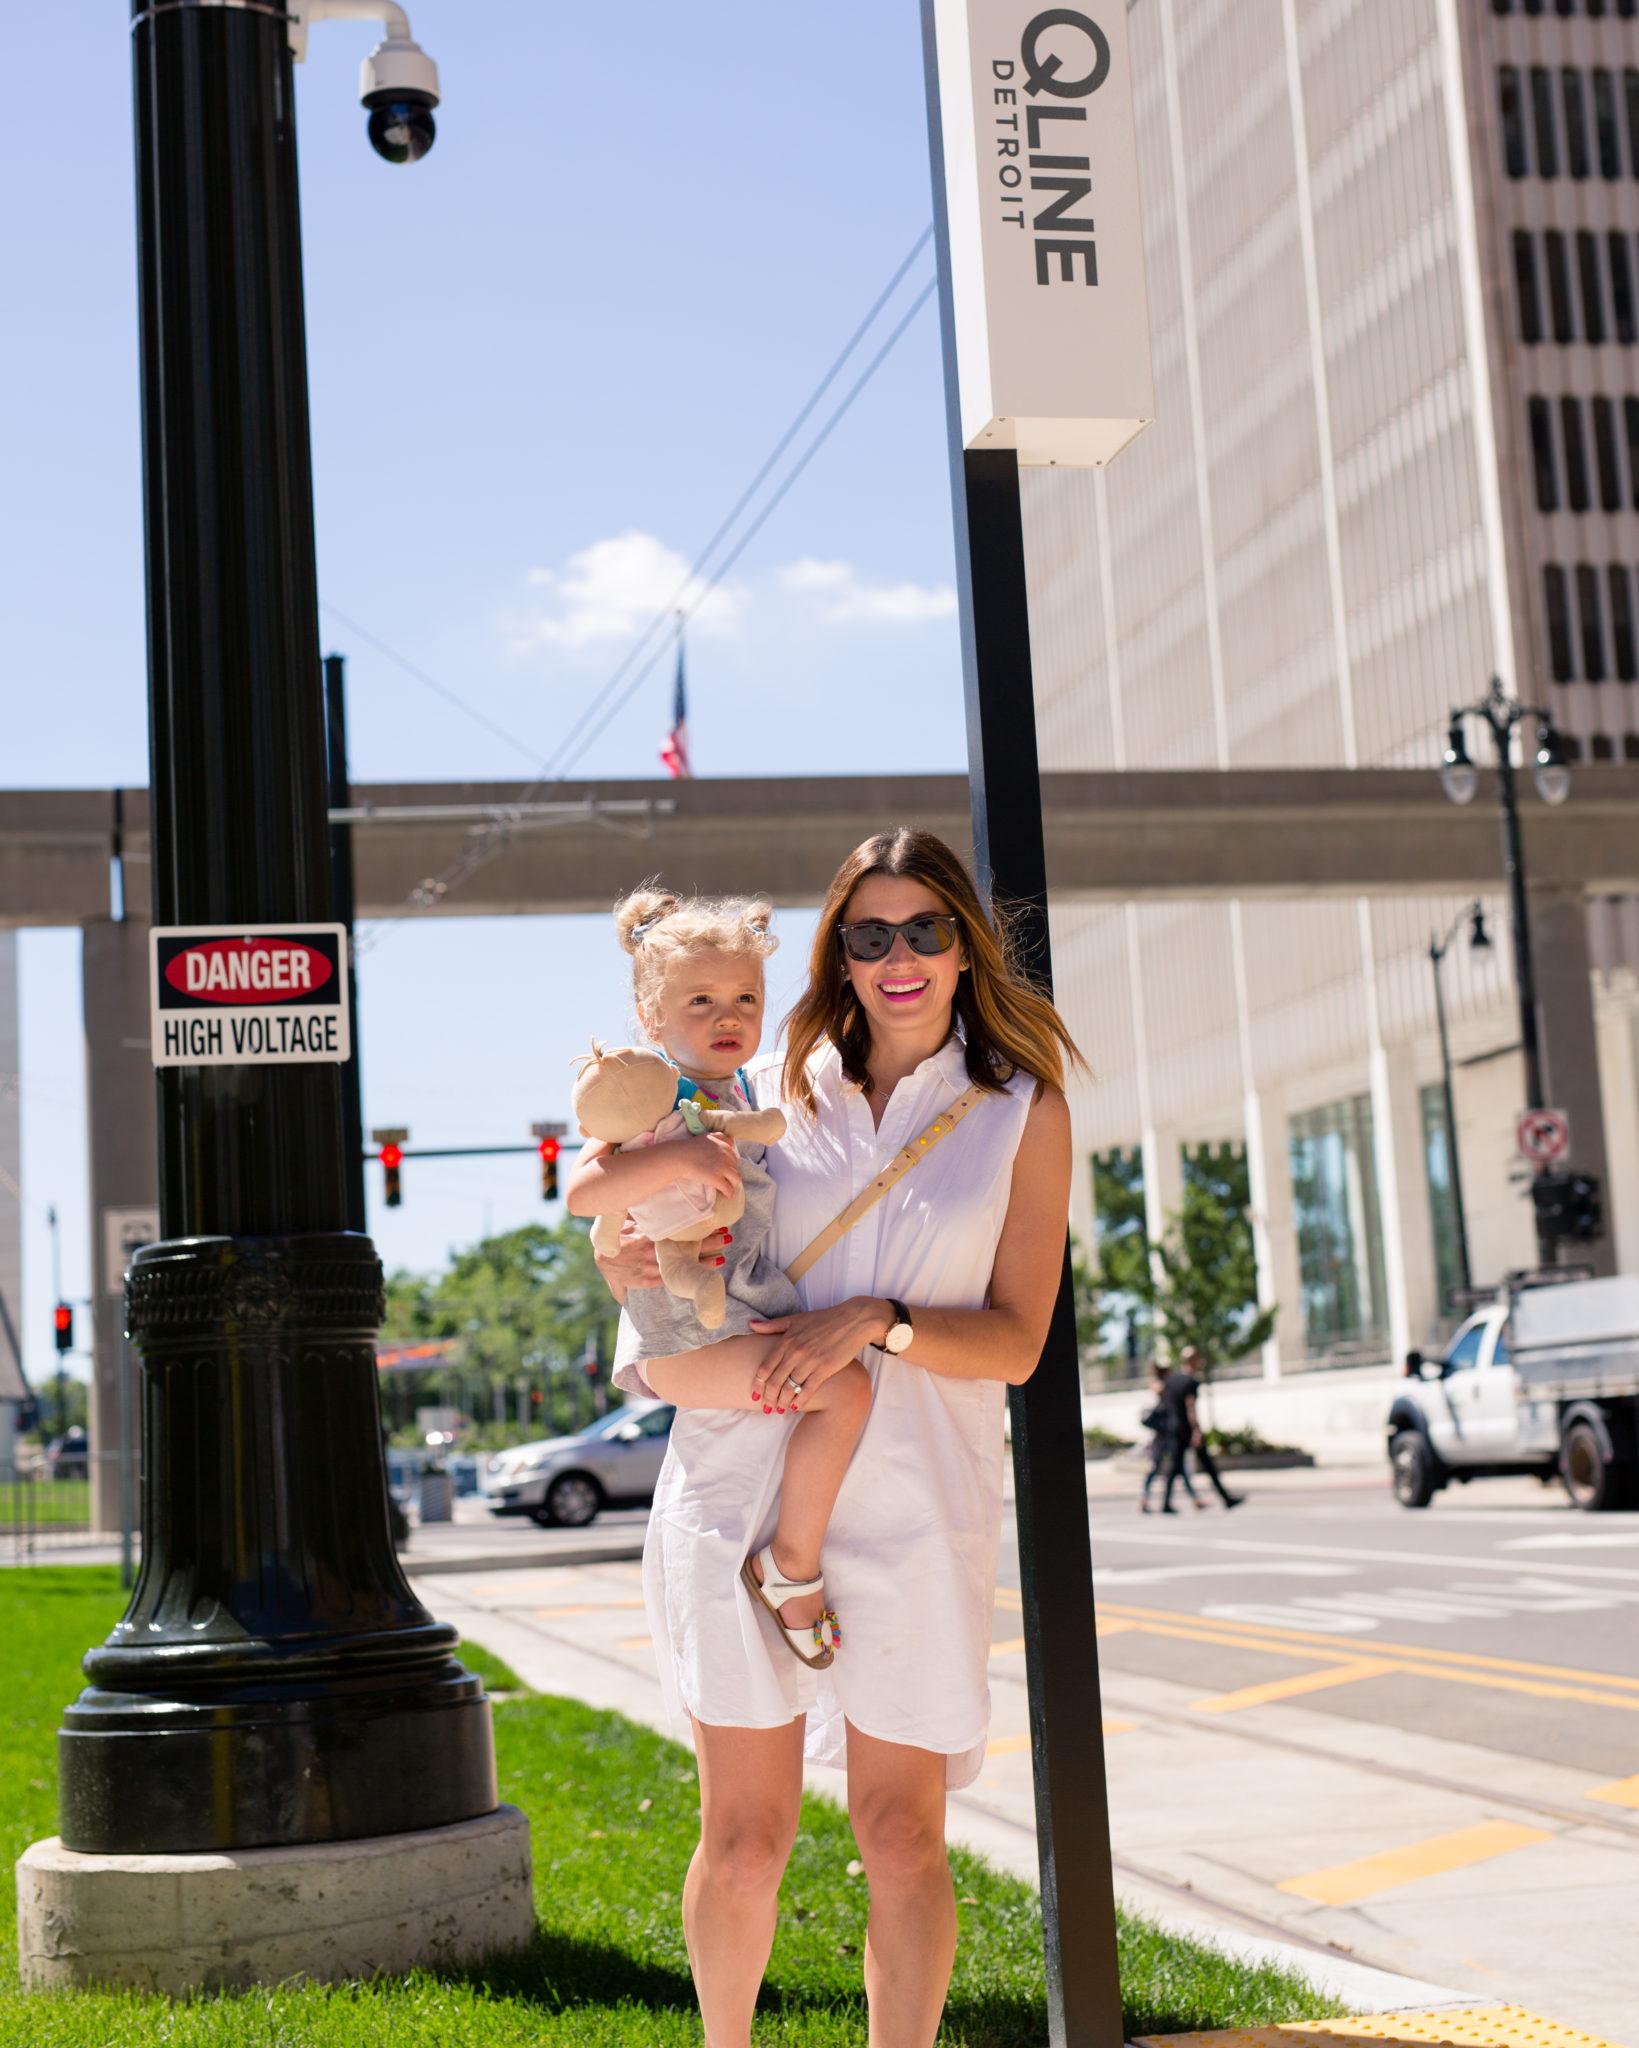 riding the new qline train downtown detroit on allweareblog.com